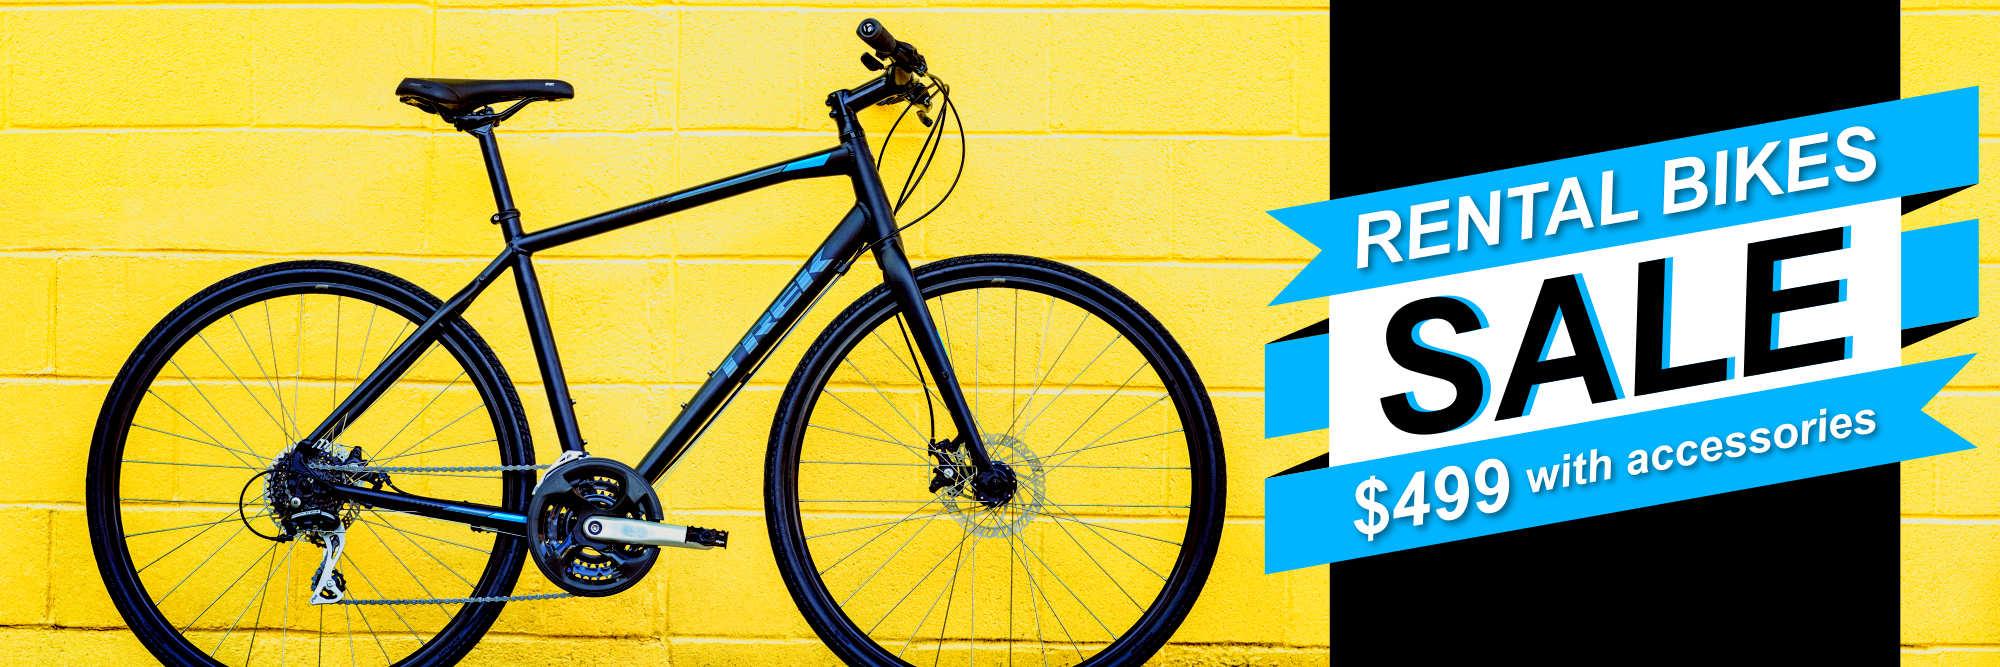 Rental Bikes Sale $499!